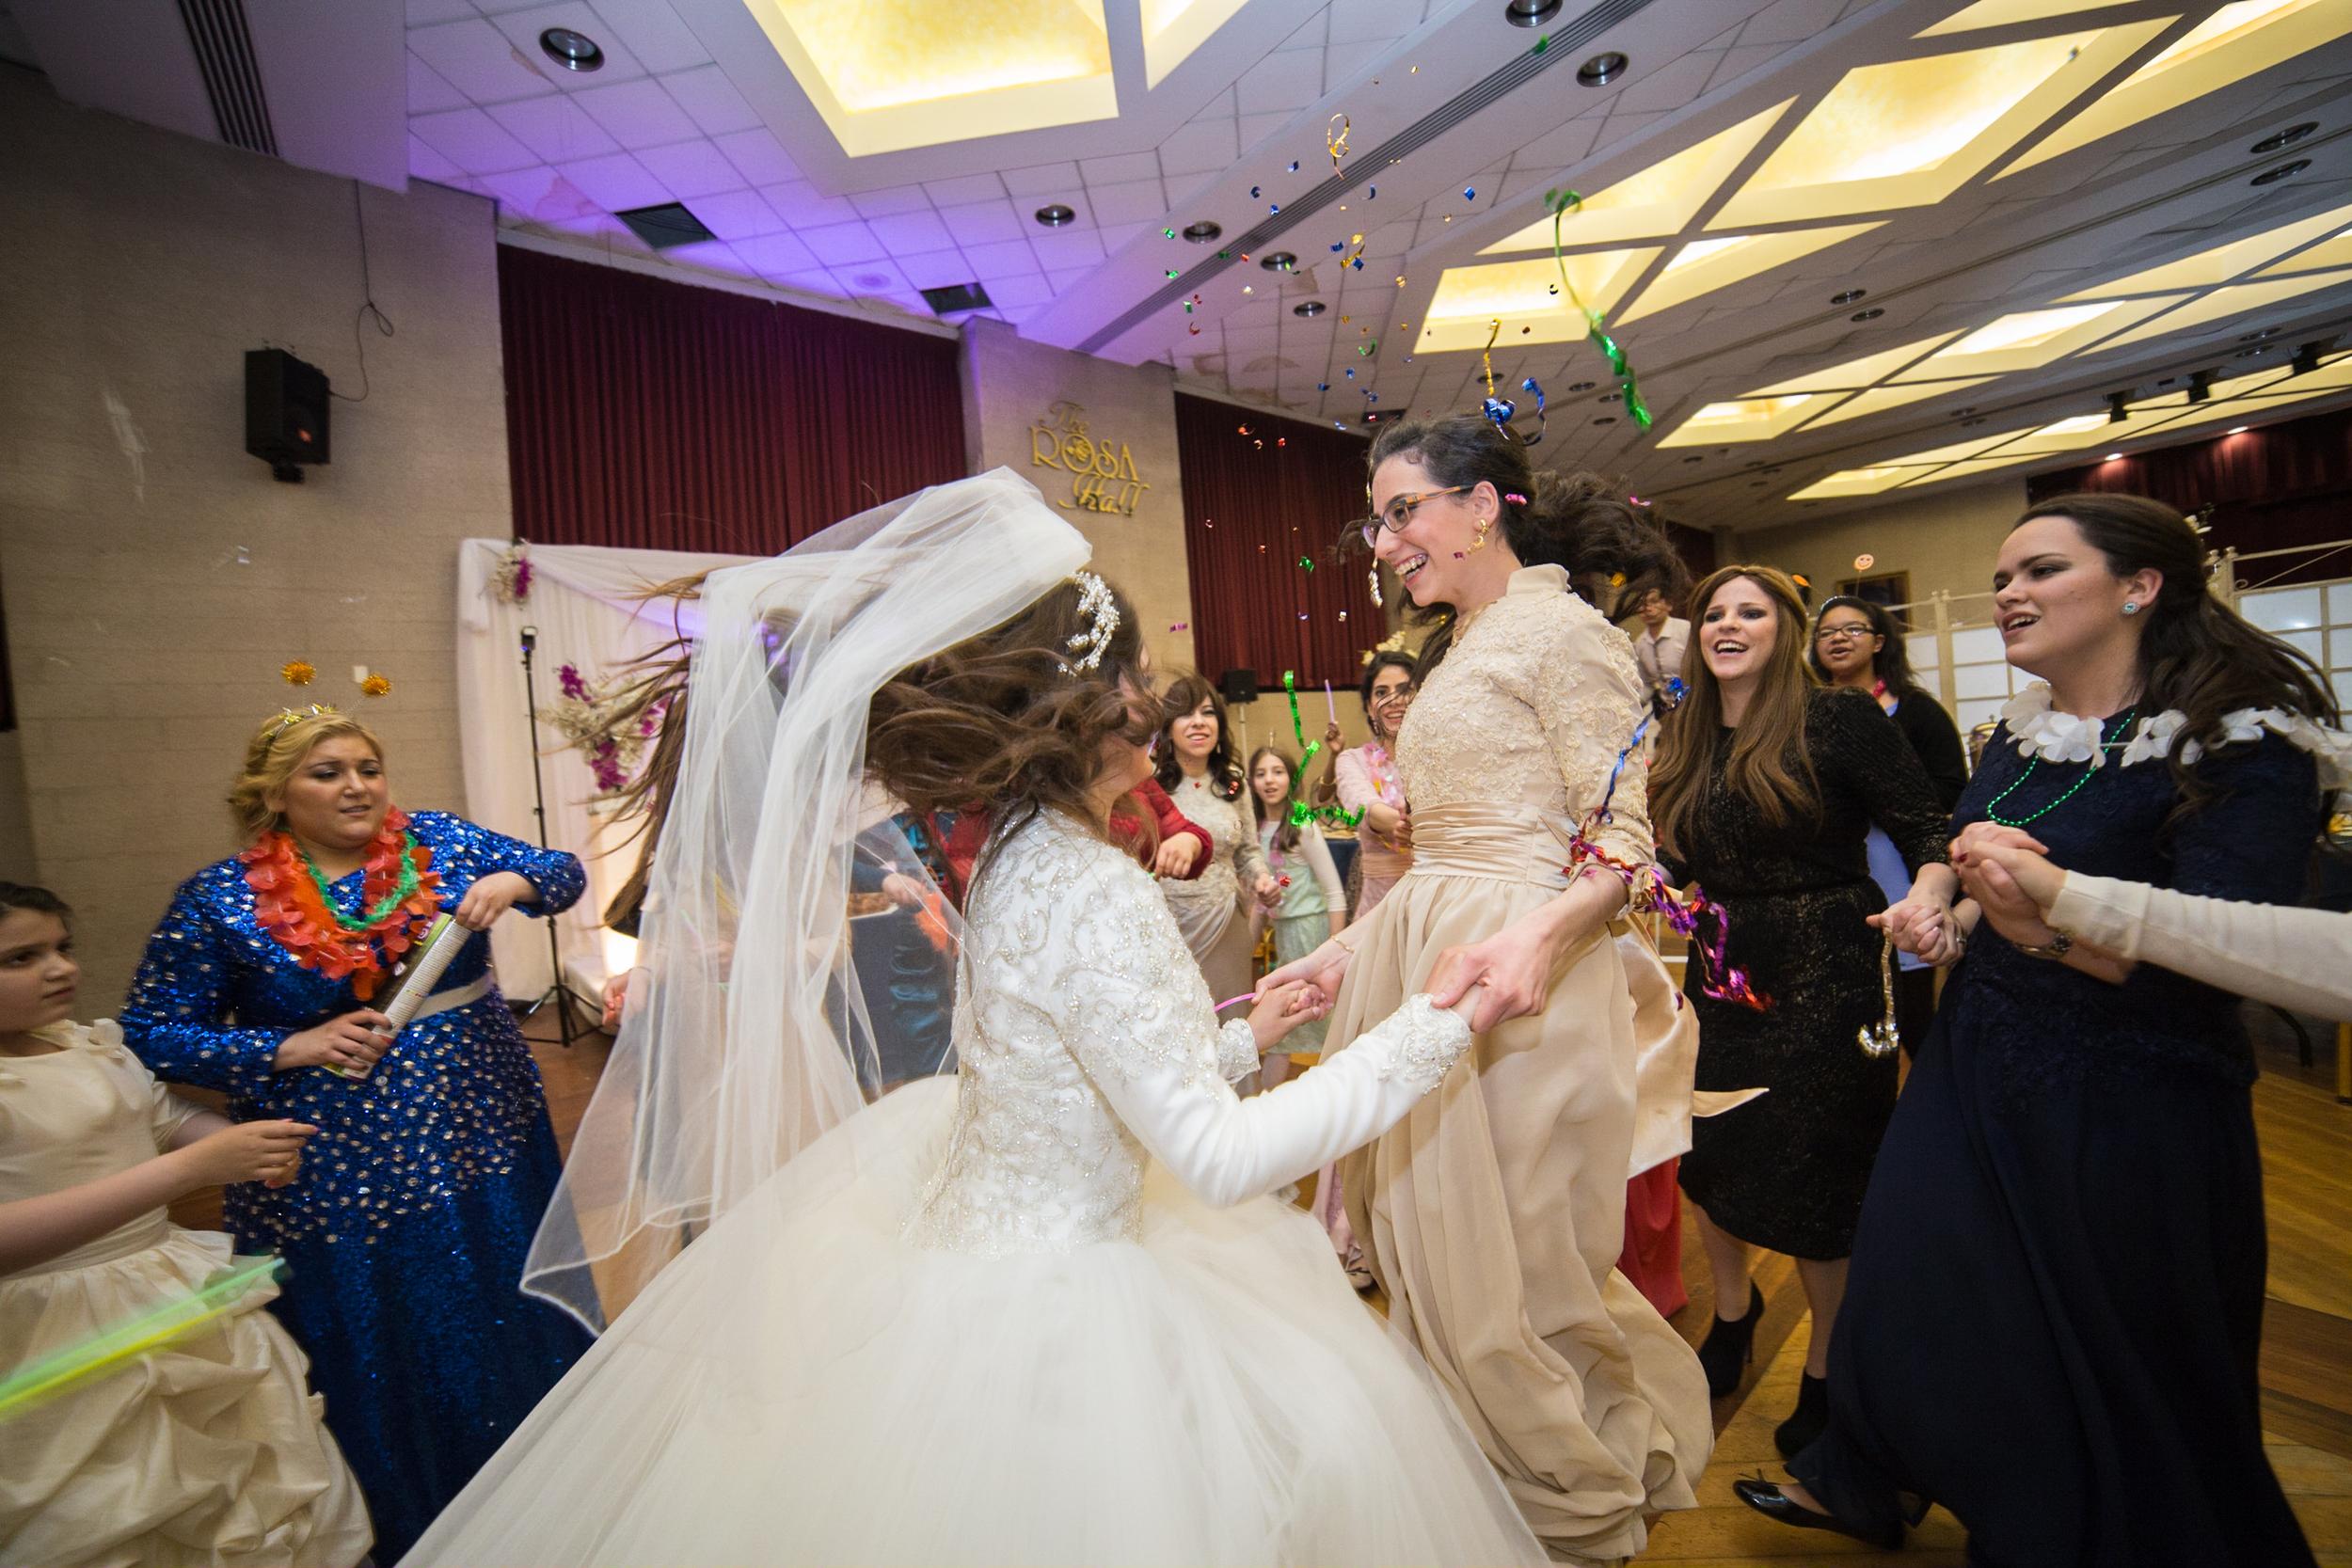 Wedding Iossi and Gitty Khafif  - Eliau Piha studio photography, new york, events, people 770 brooklyn -0860.jpg